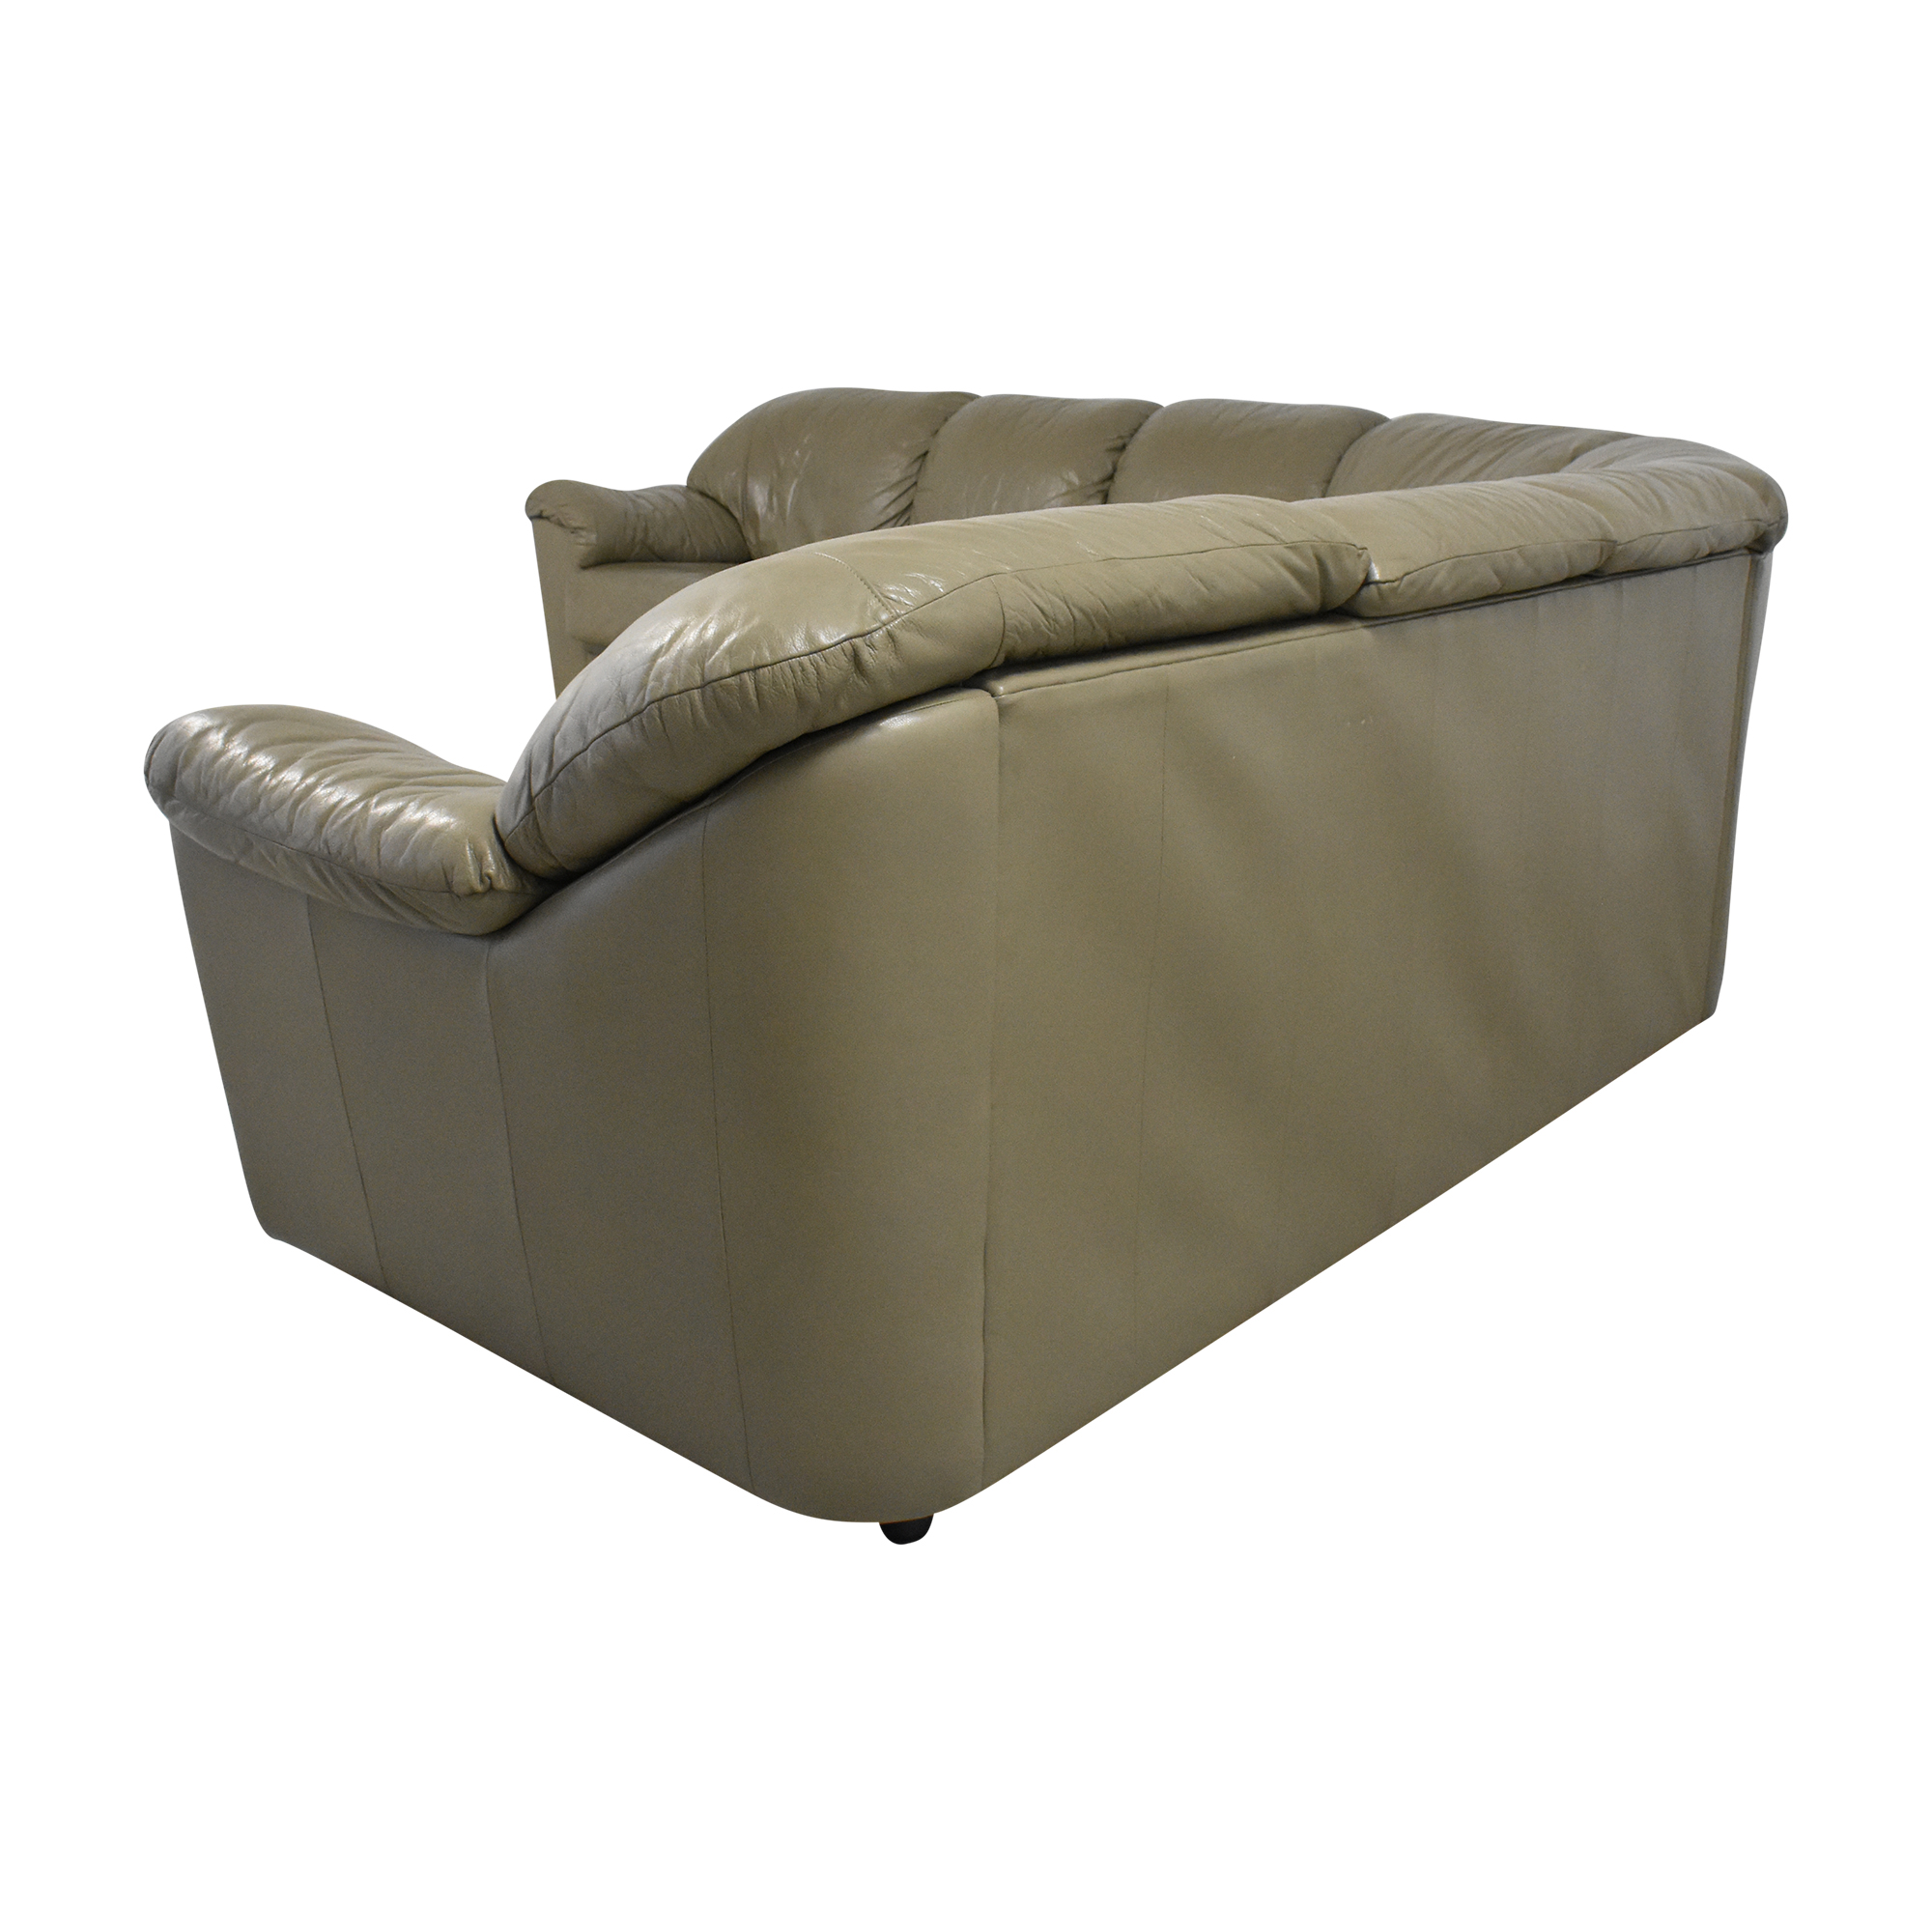 Jaymar Jaymar Custom Corner Sectional Sofa price